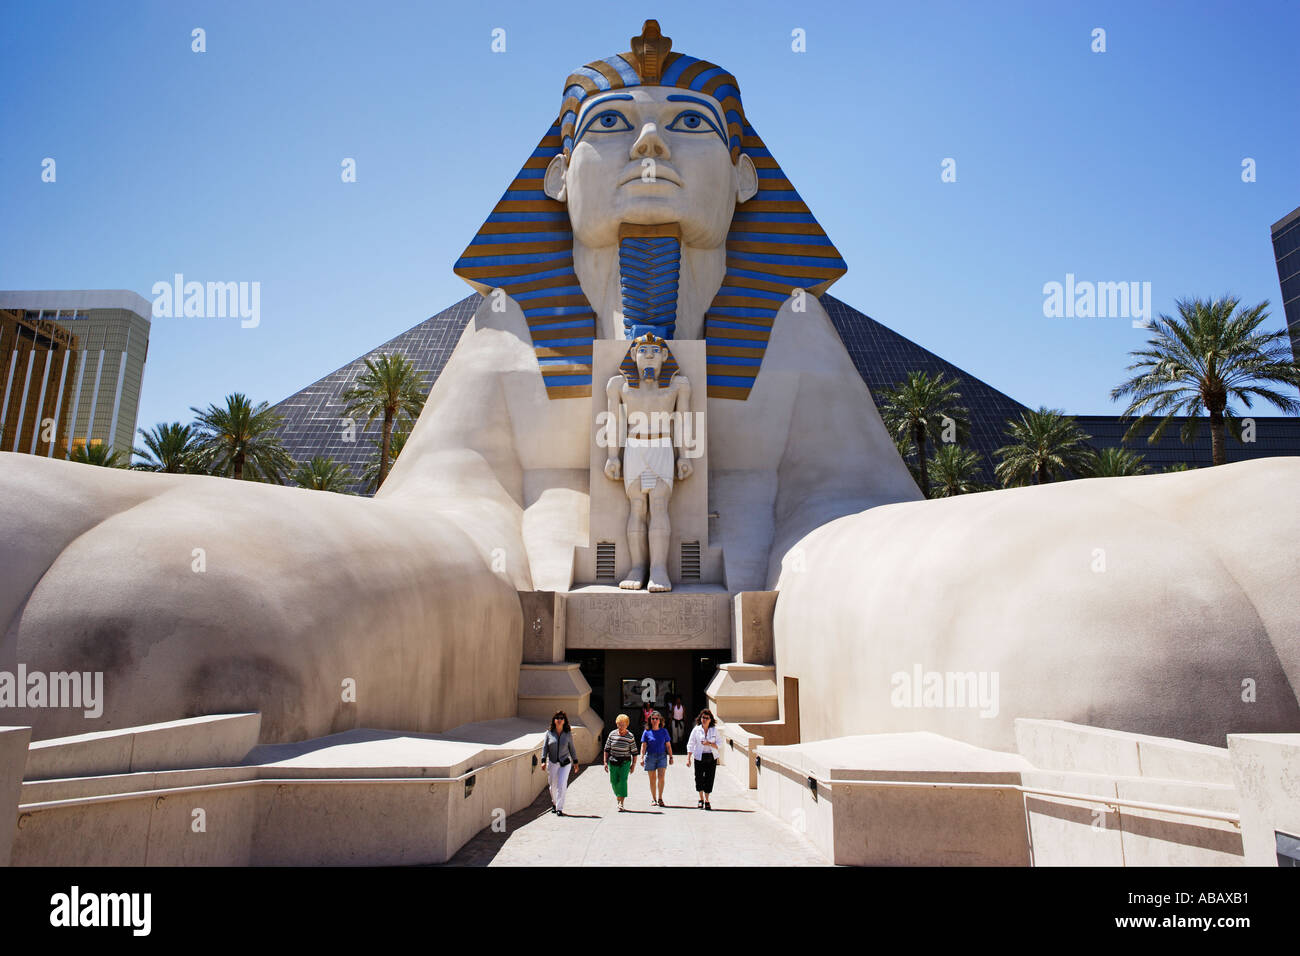 Las Vegas Luxor Hotel Casino Sphinx And Pyramid Stock Photo 4190896